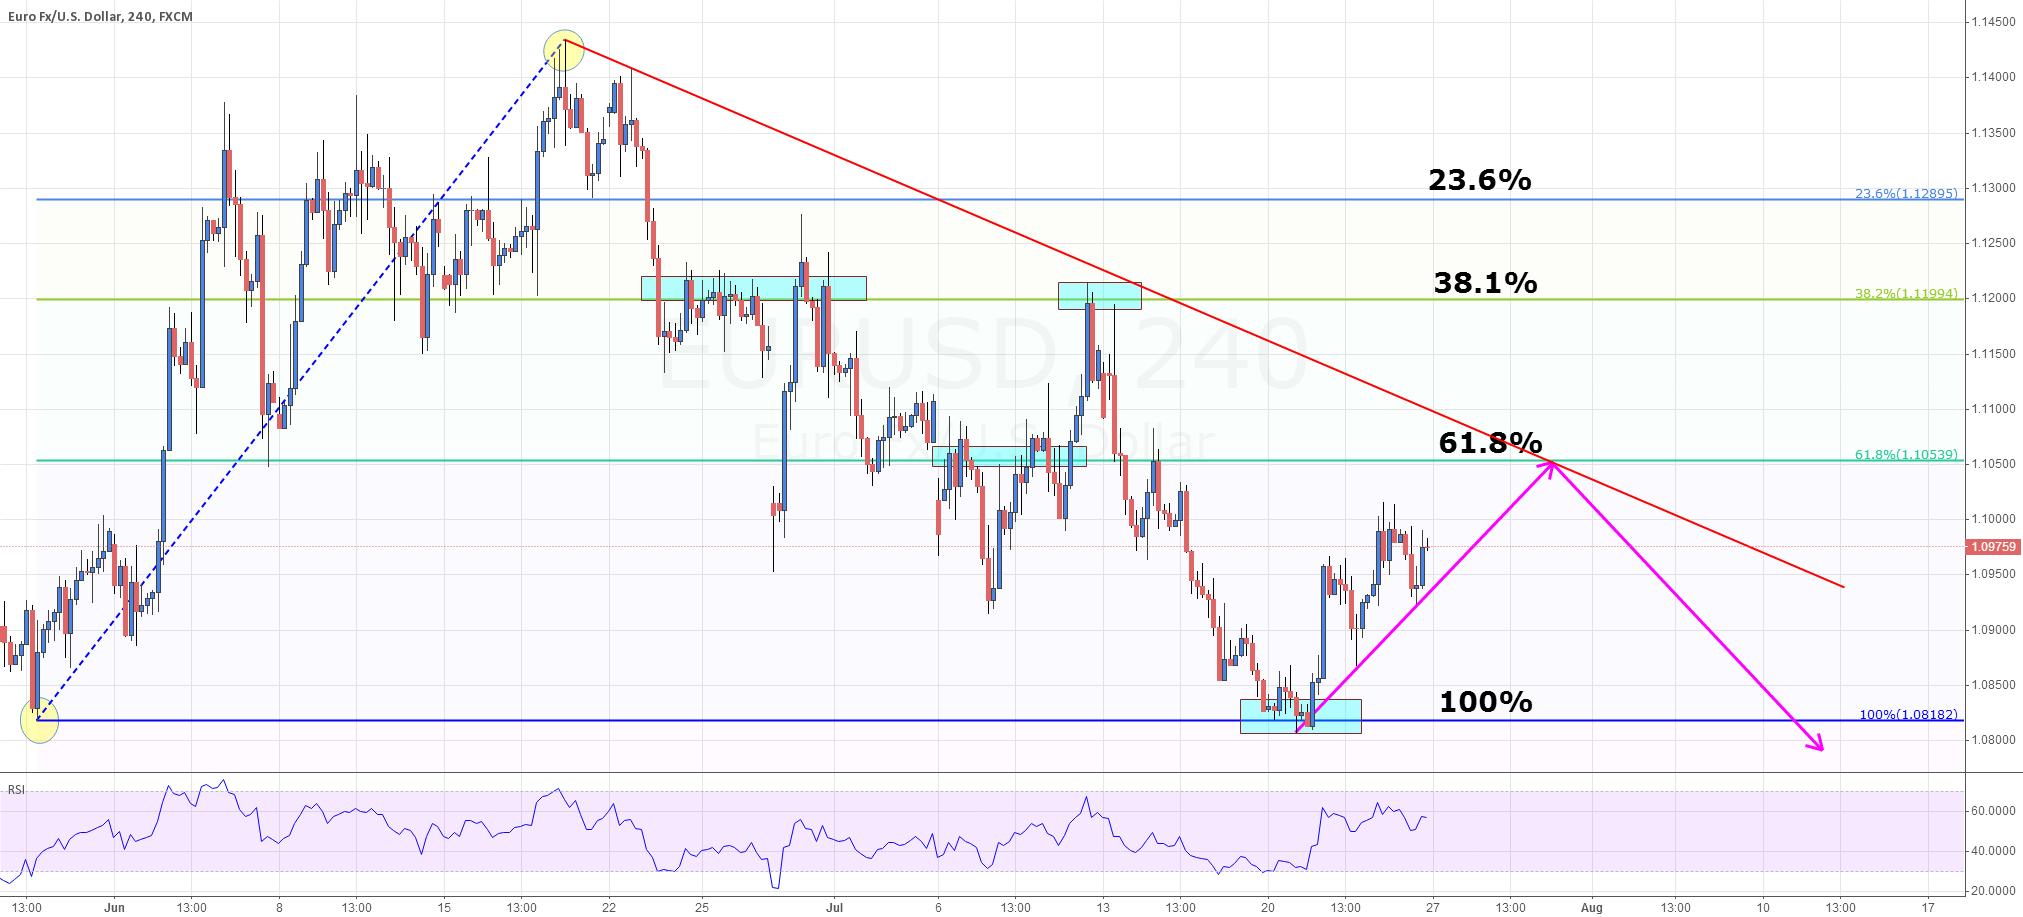 EUR/USD is gonna test 61.8% Retracement next week.